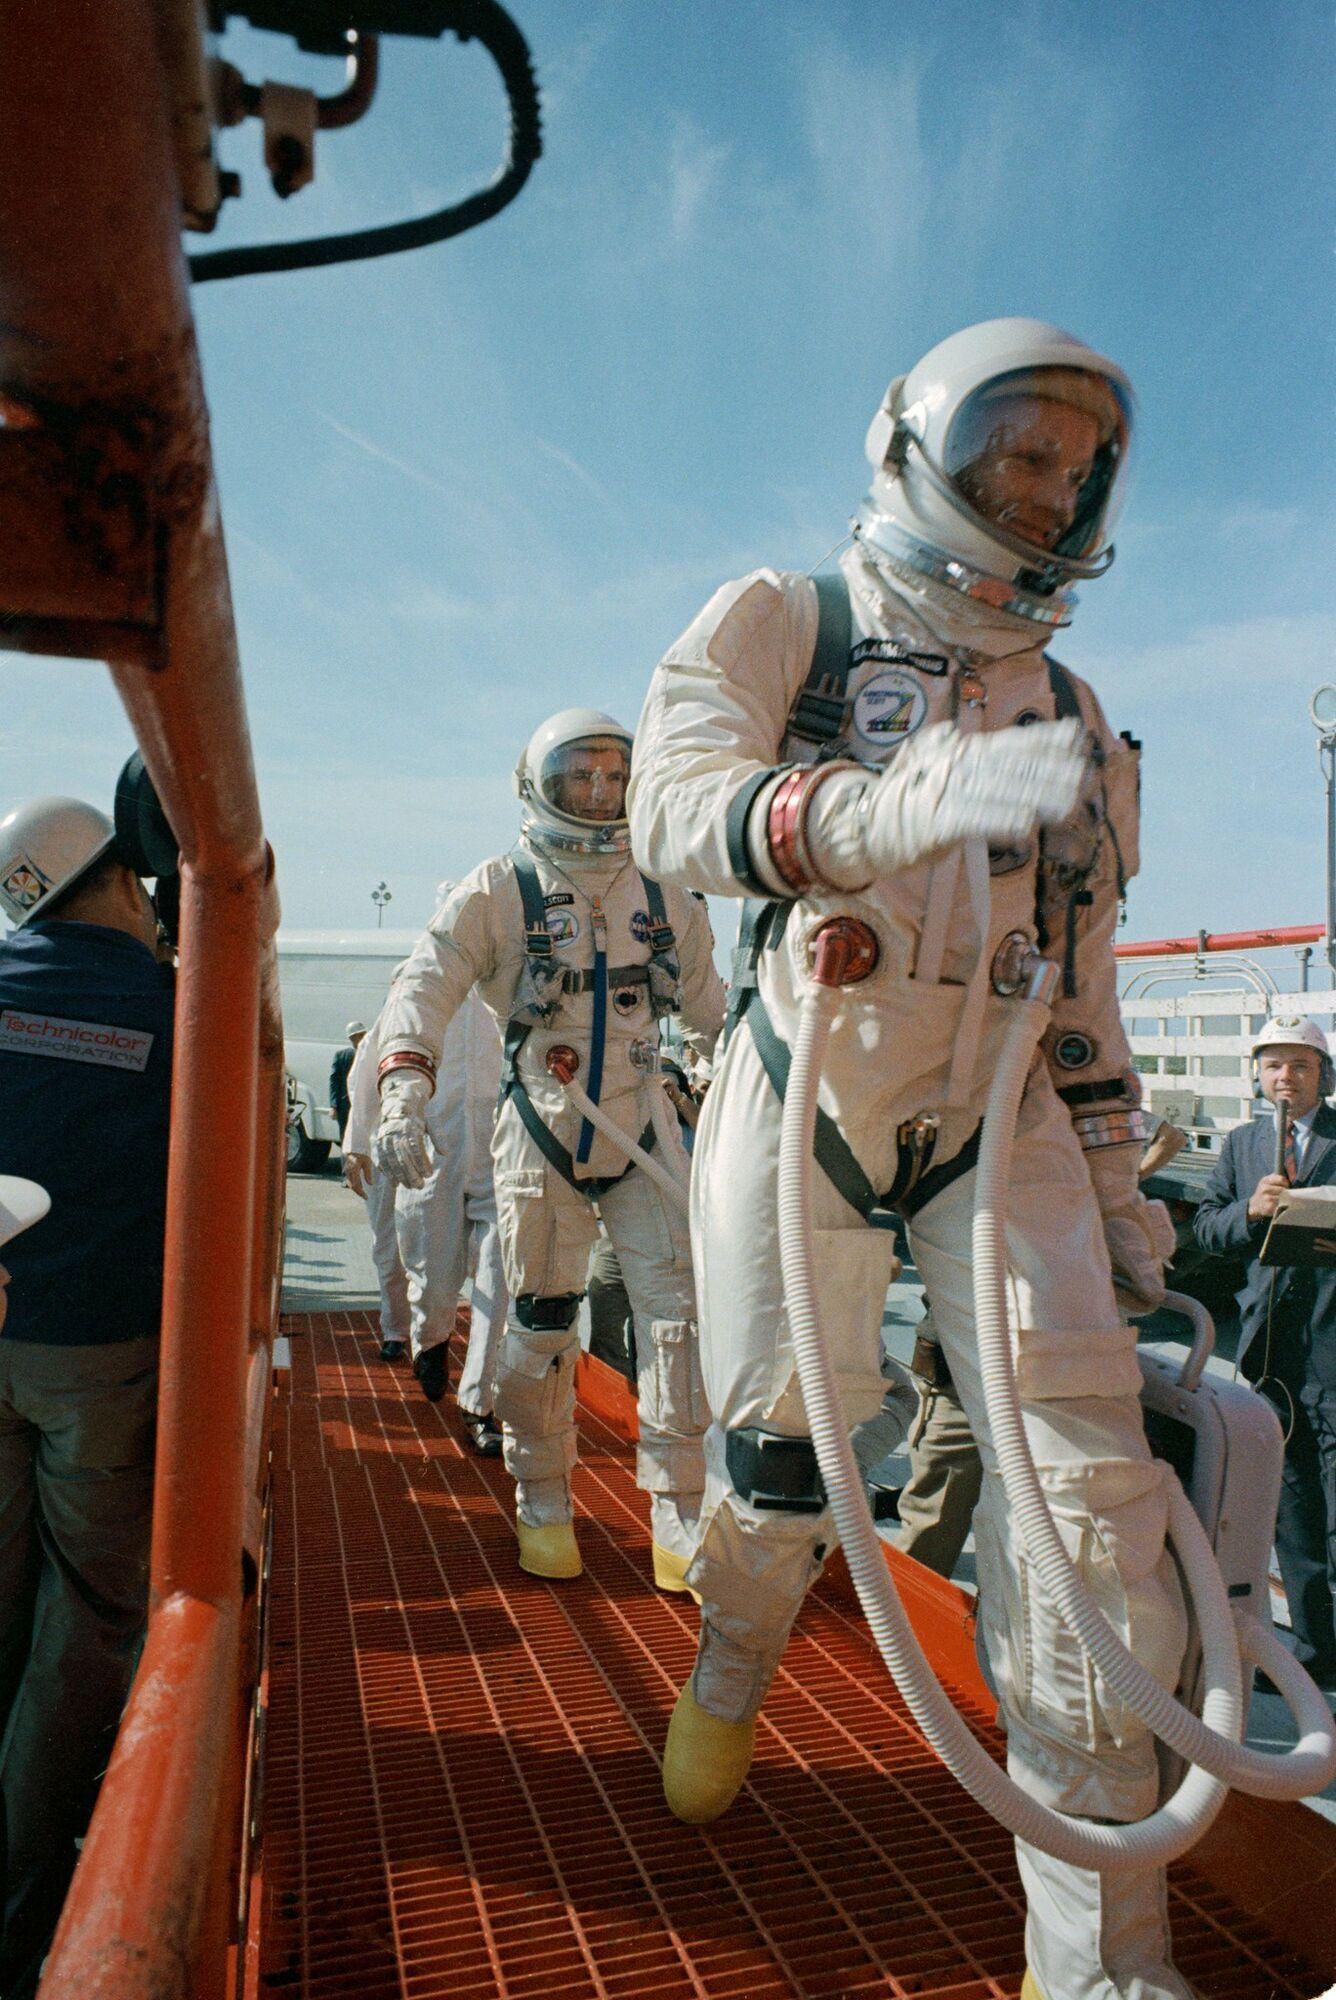 Gemini 8 crew before launch walking to Gemini 8 spacecraft